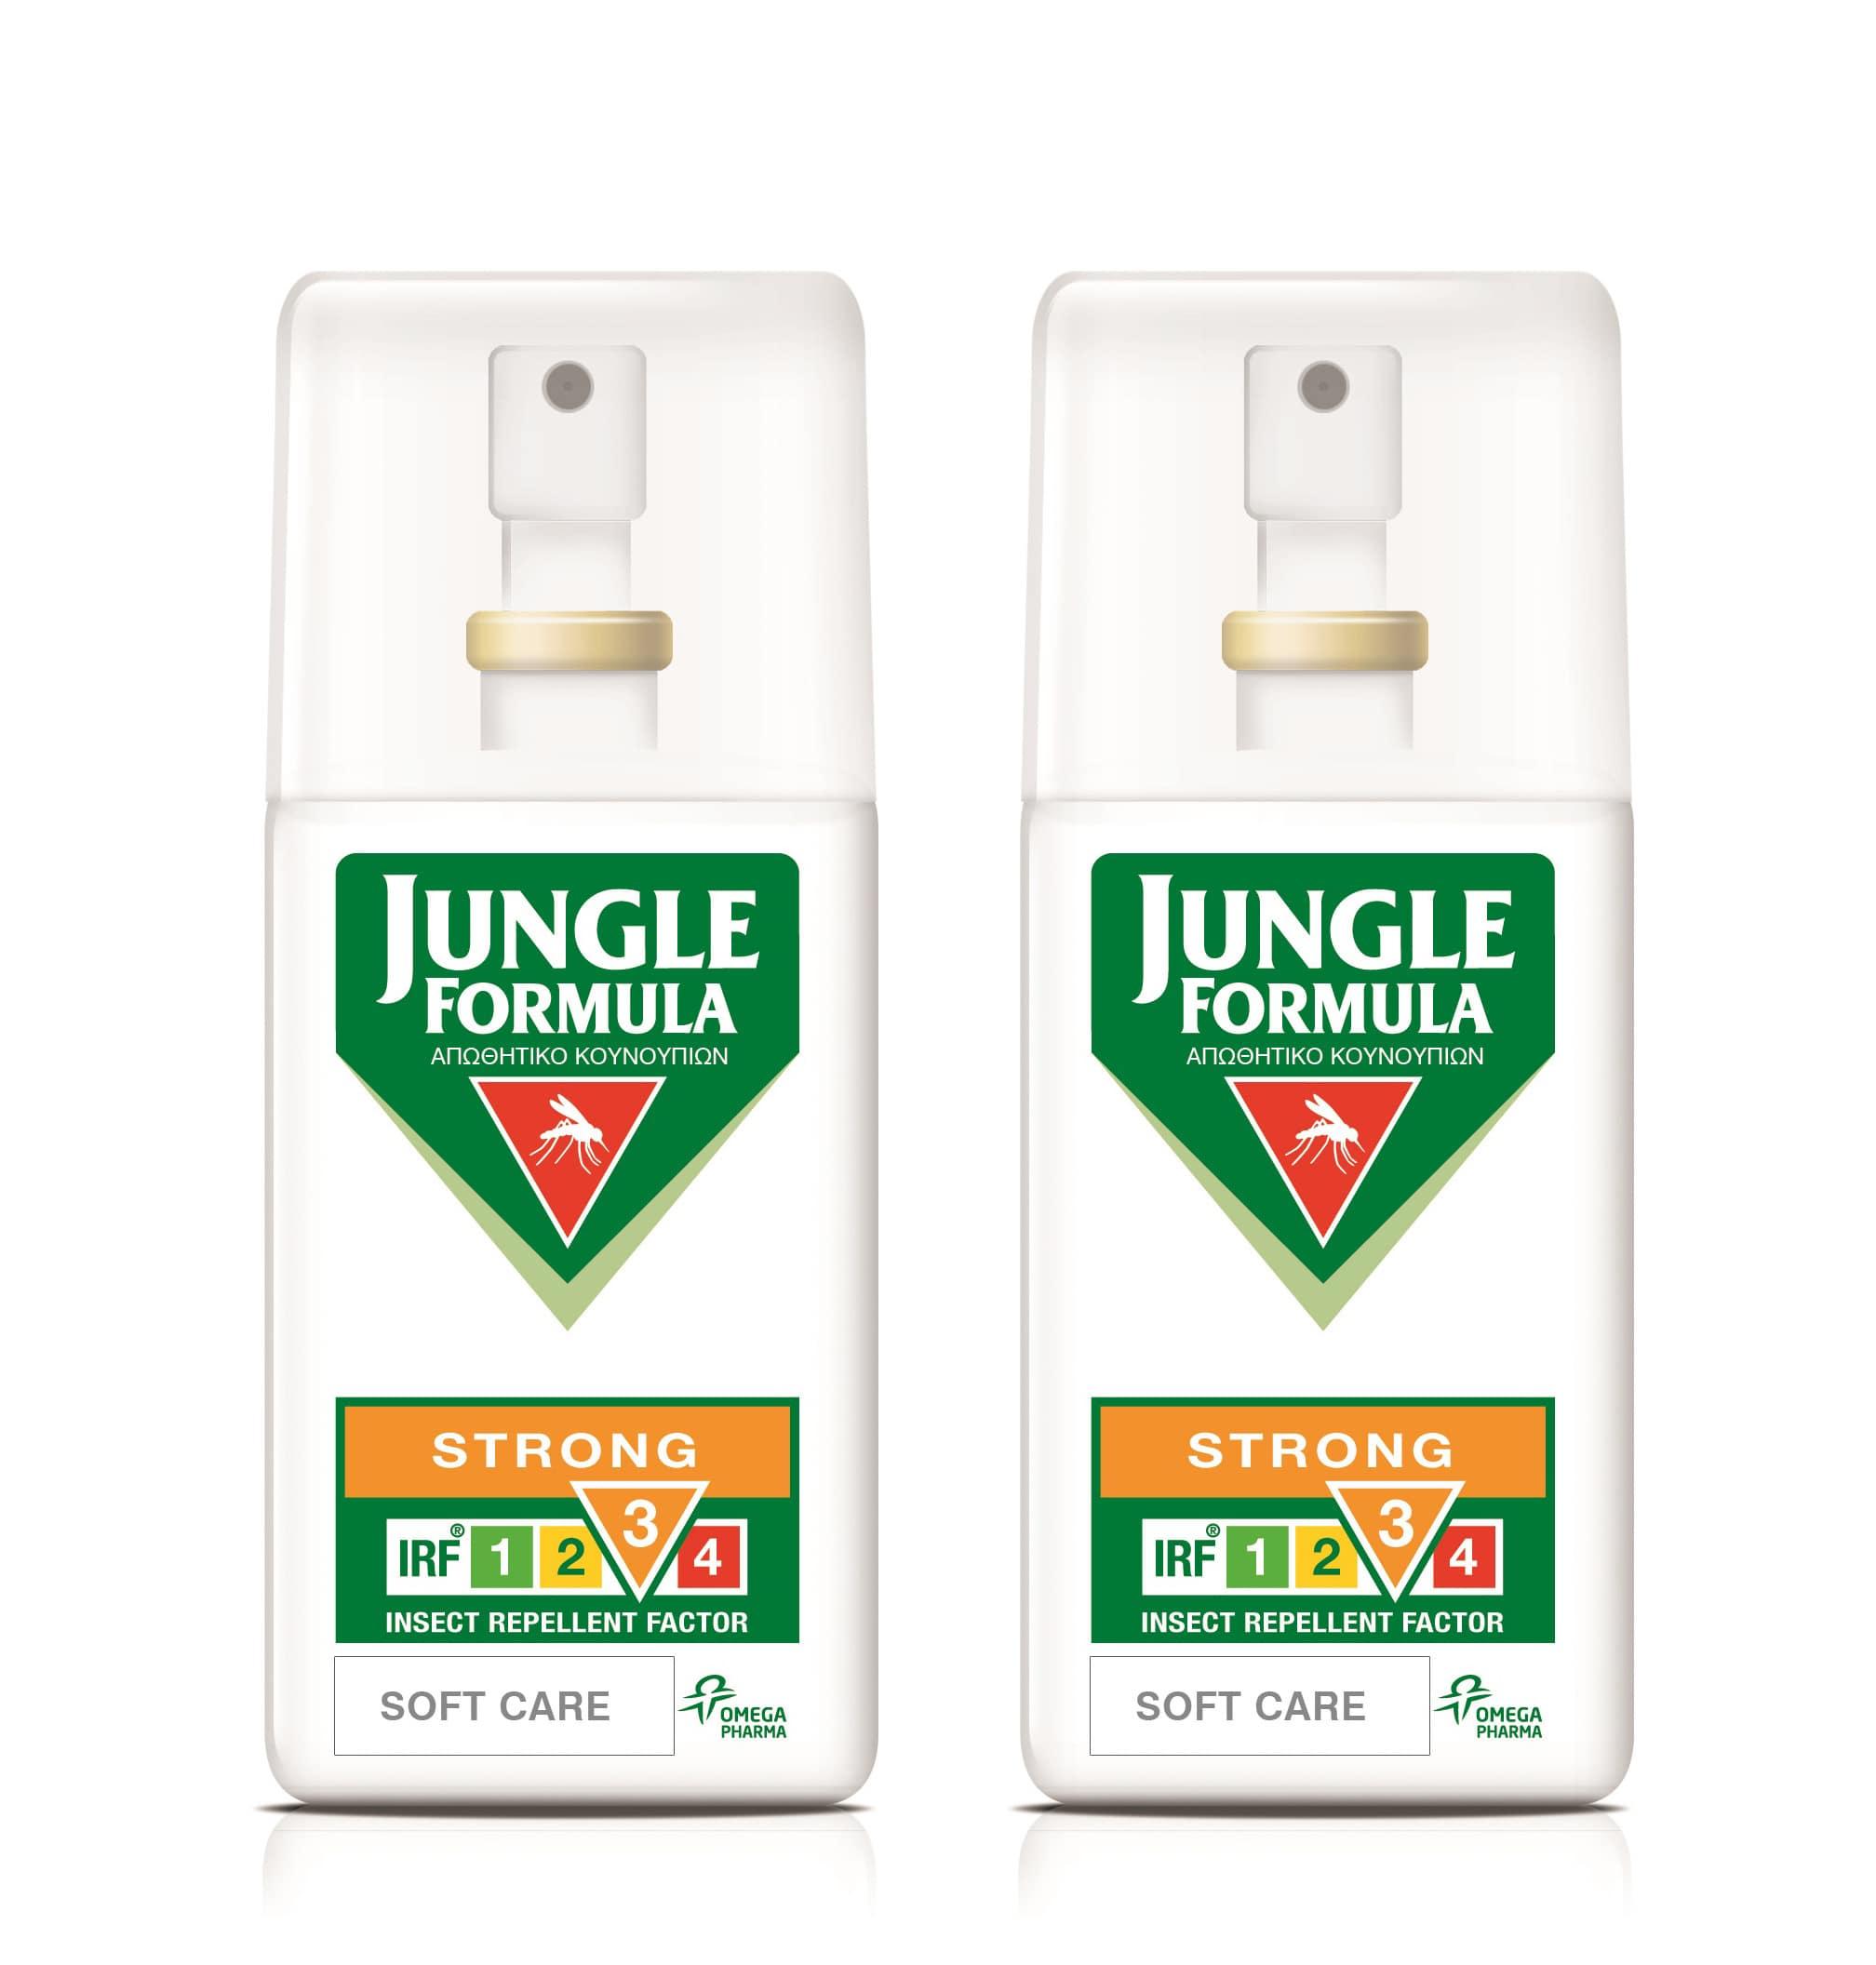 2x Jungle Formula Strong Soft Care Αντικουνουπικό spray με καταπραϋντικά συστατικά, 2 x 75ml